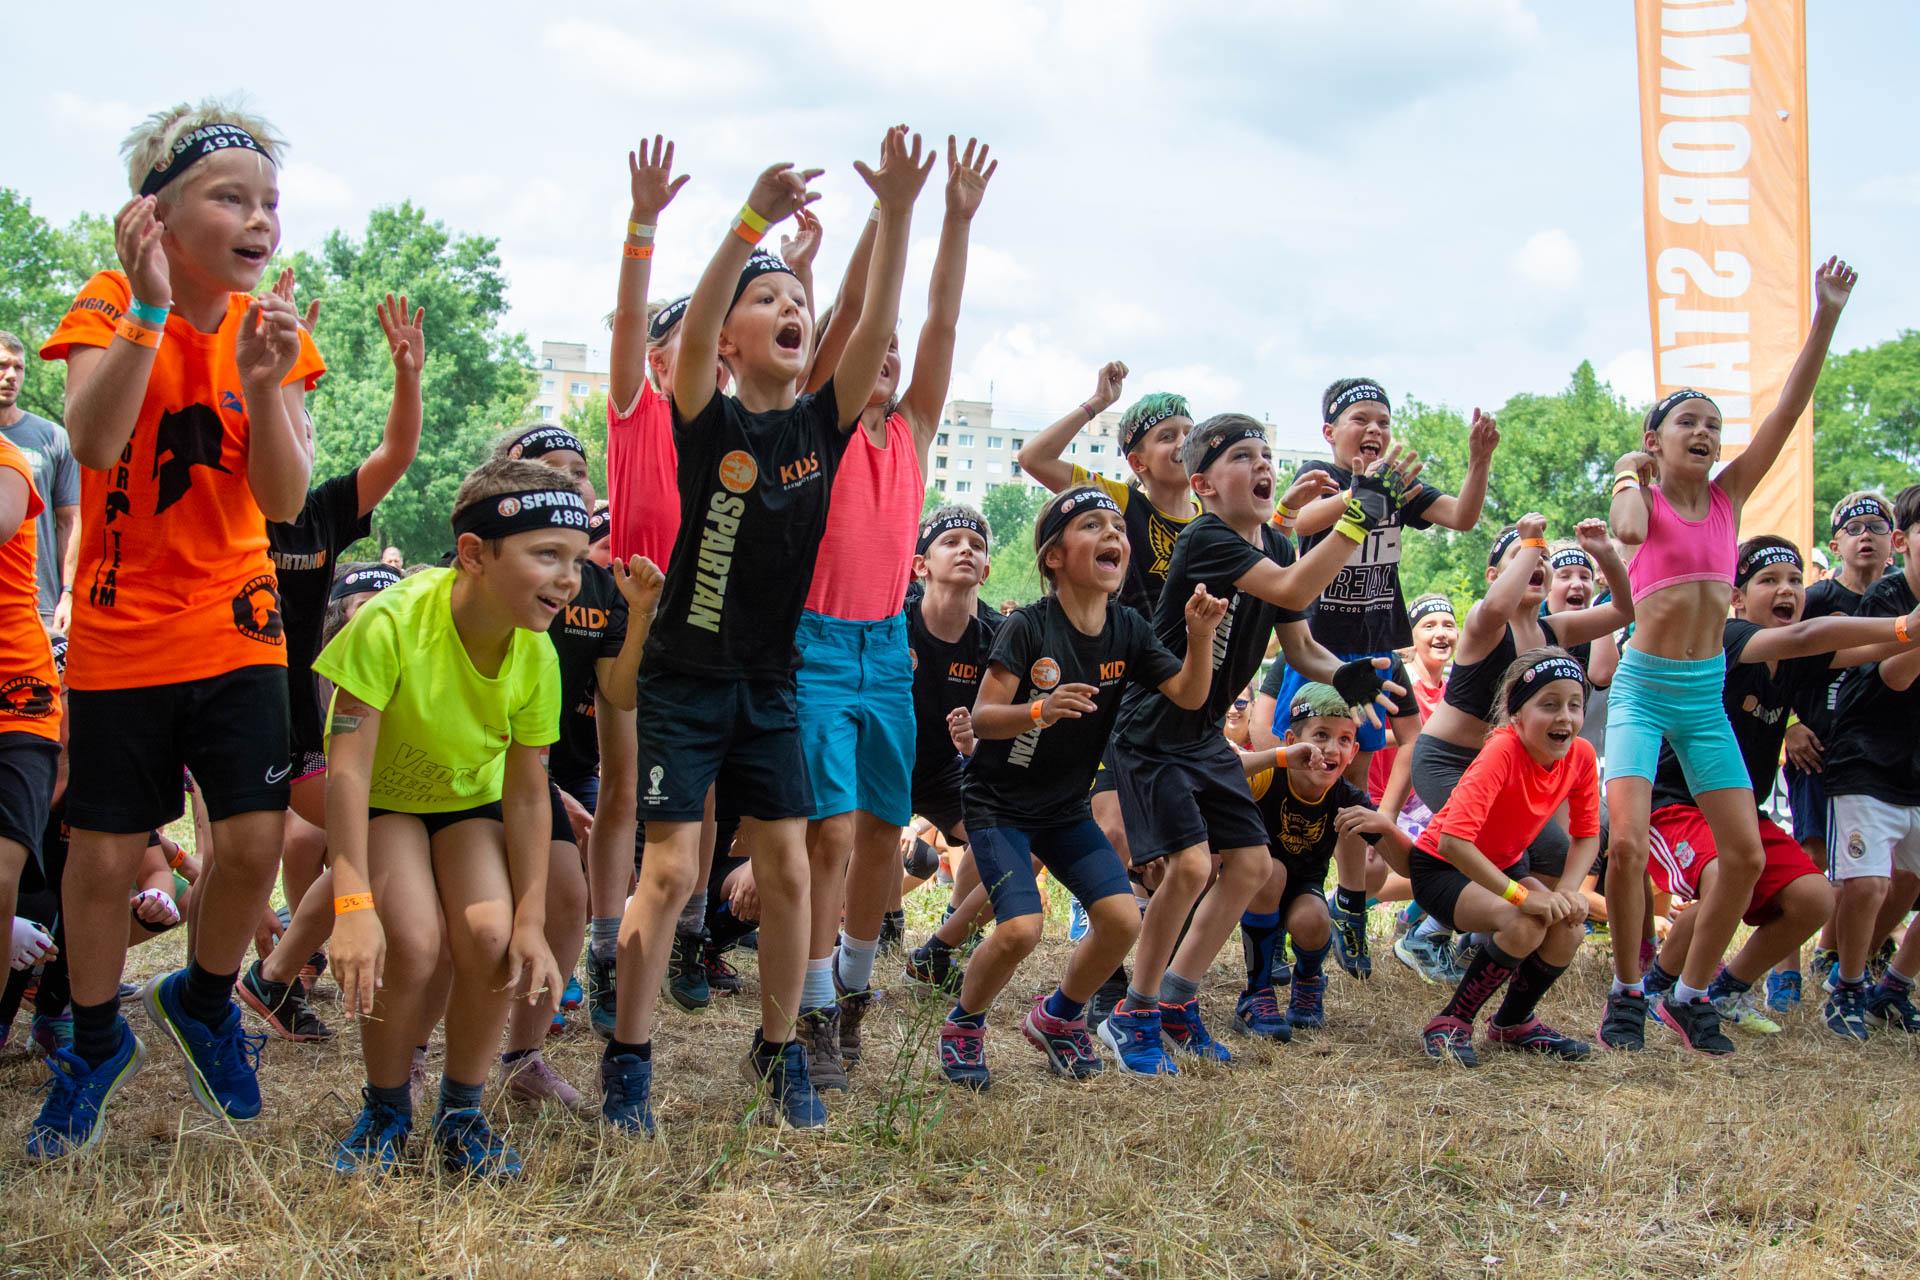 Spartan Race - Kazincbarcika - vasárnap 2.